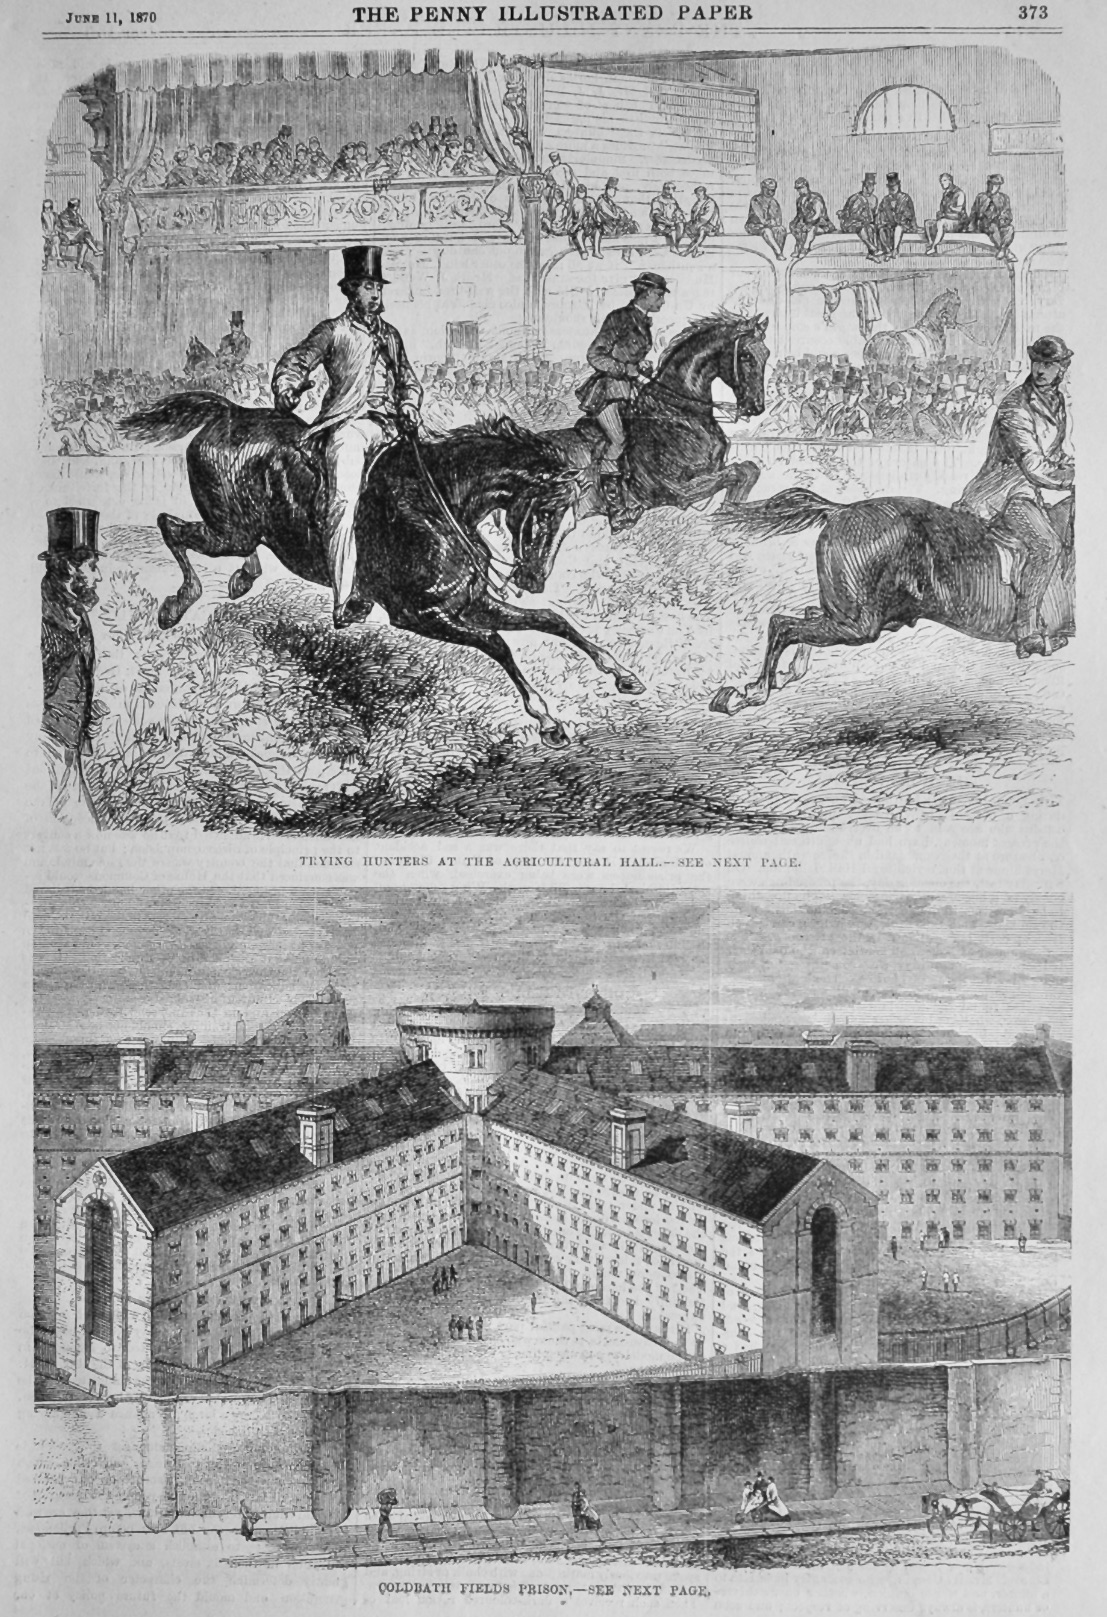 Coldbath Fields Prison.  1870.